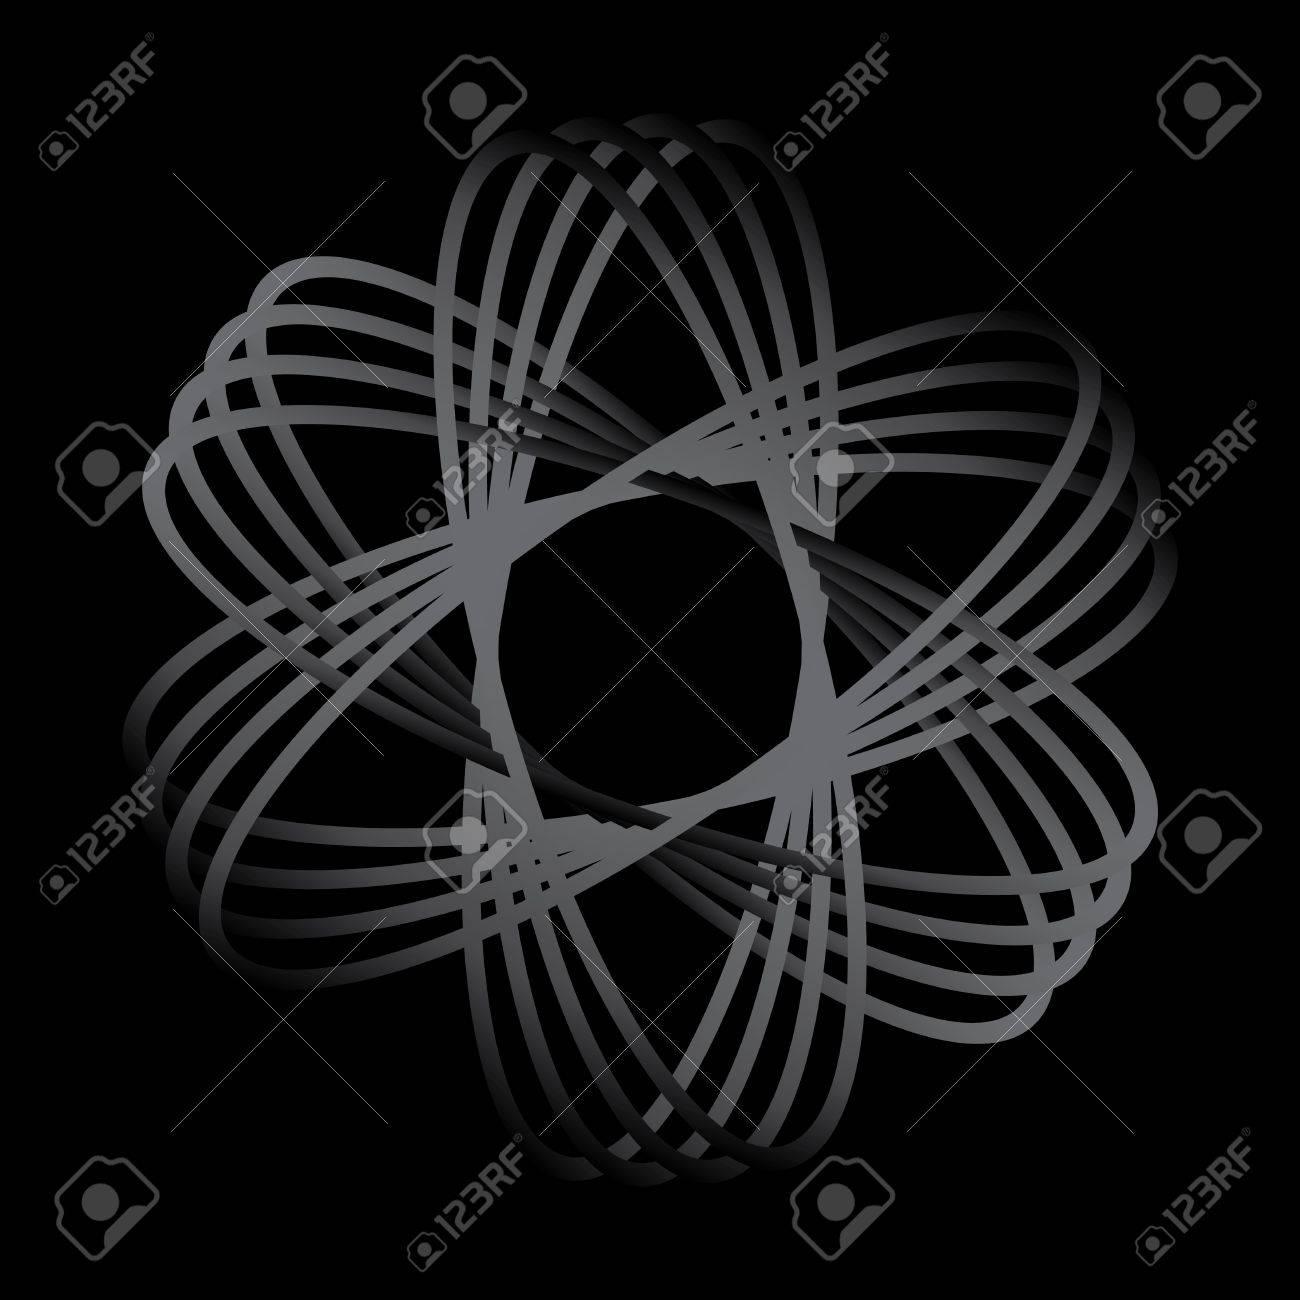 Atom part on black bakground vector Stock Vector - 15541458